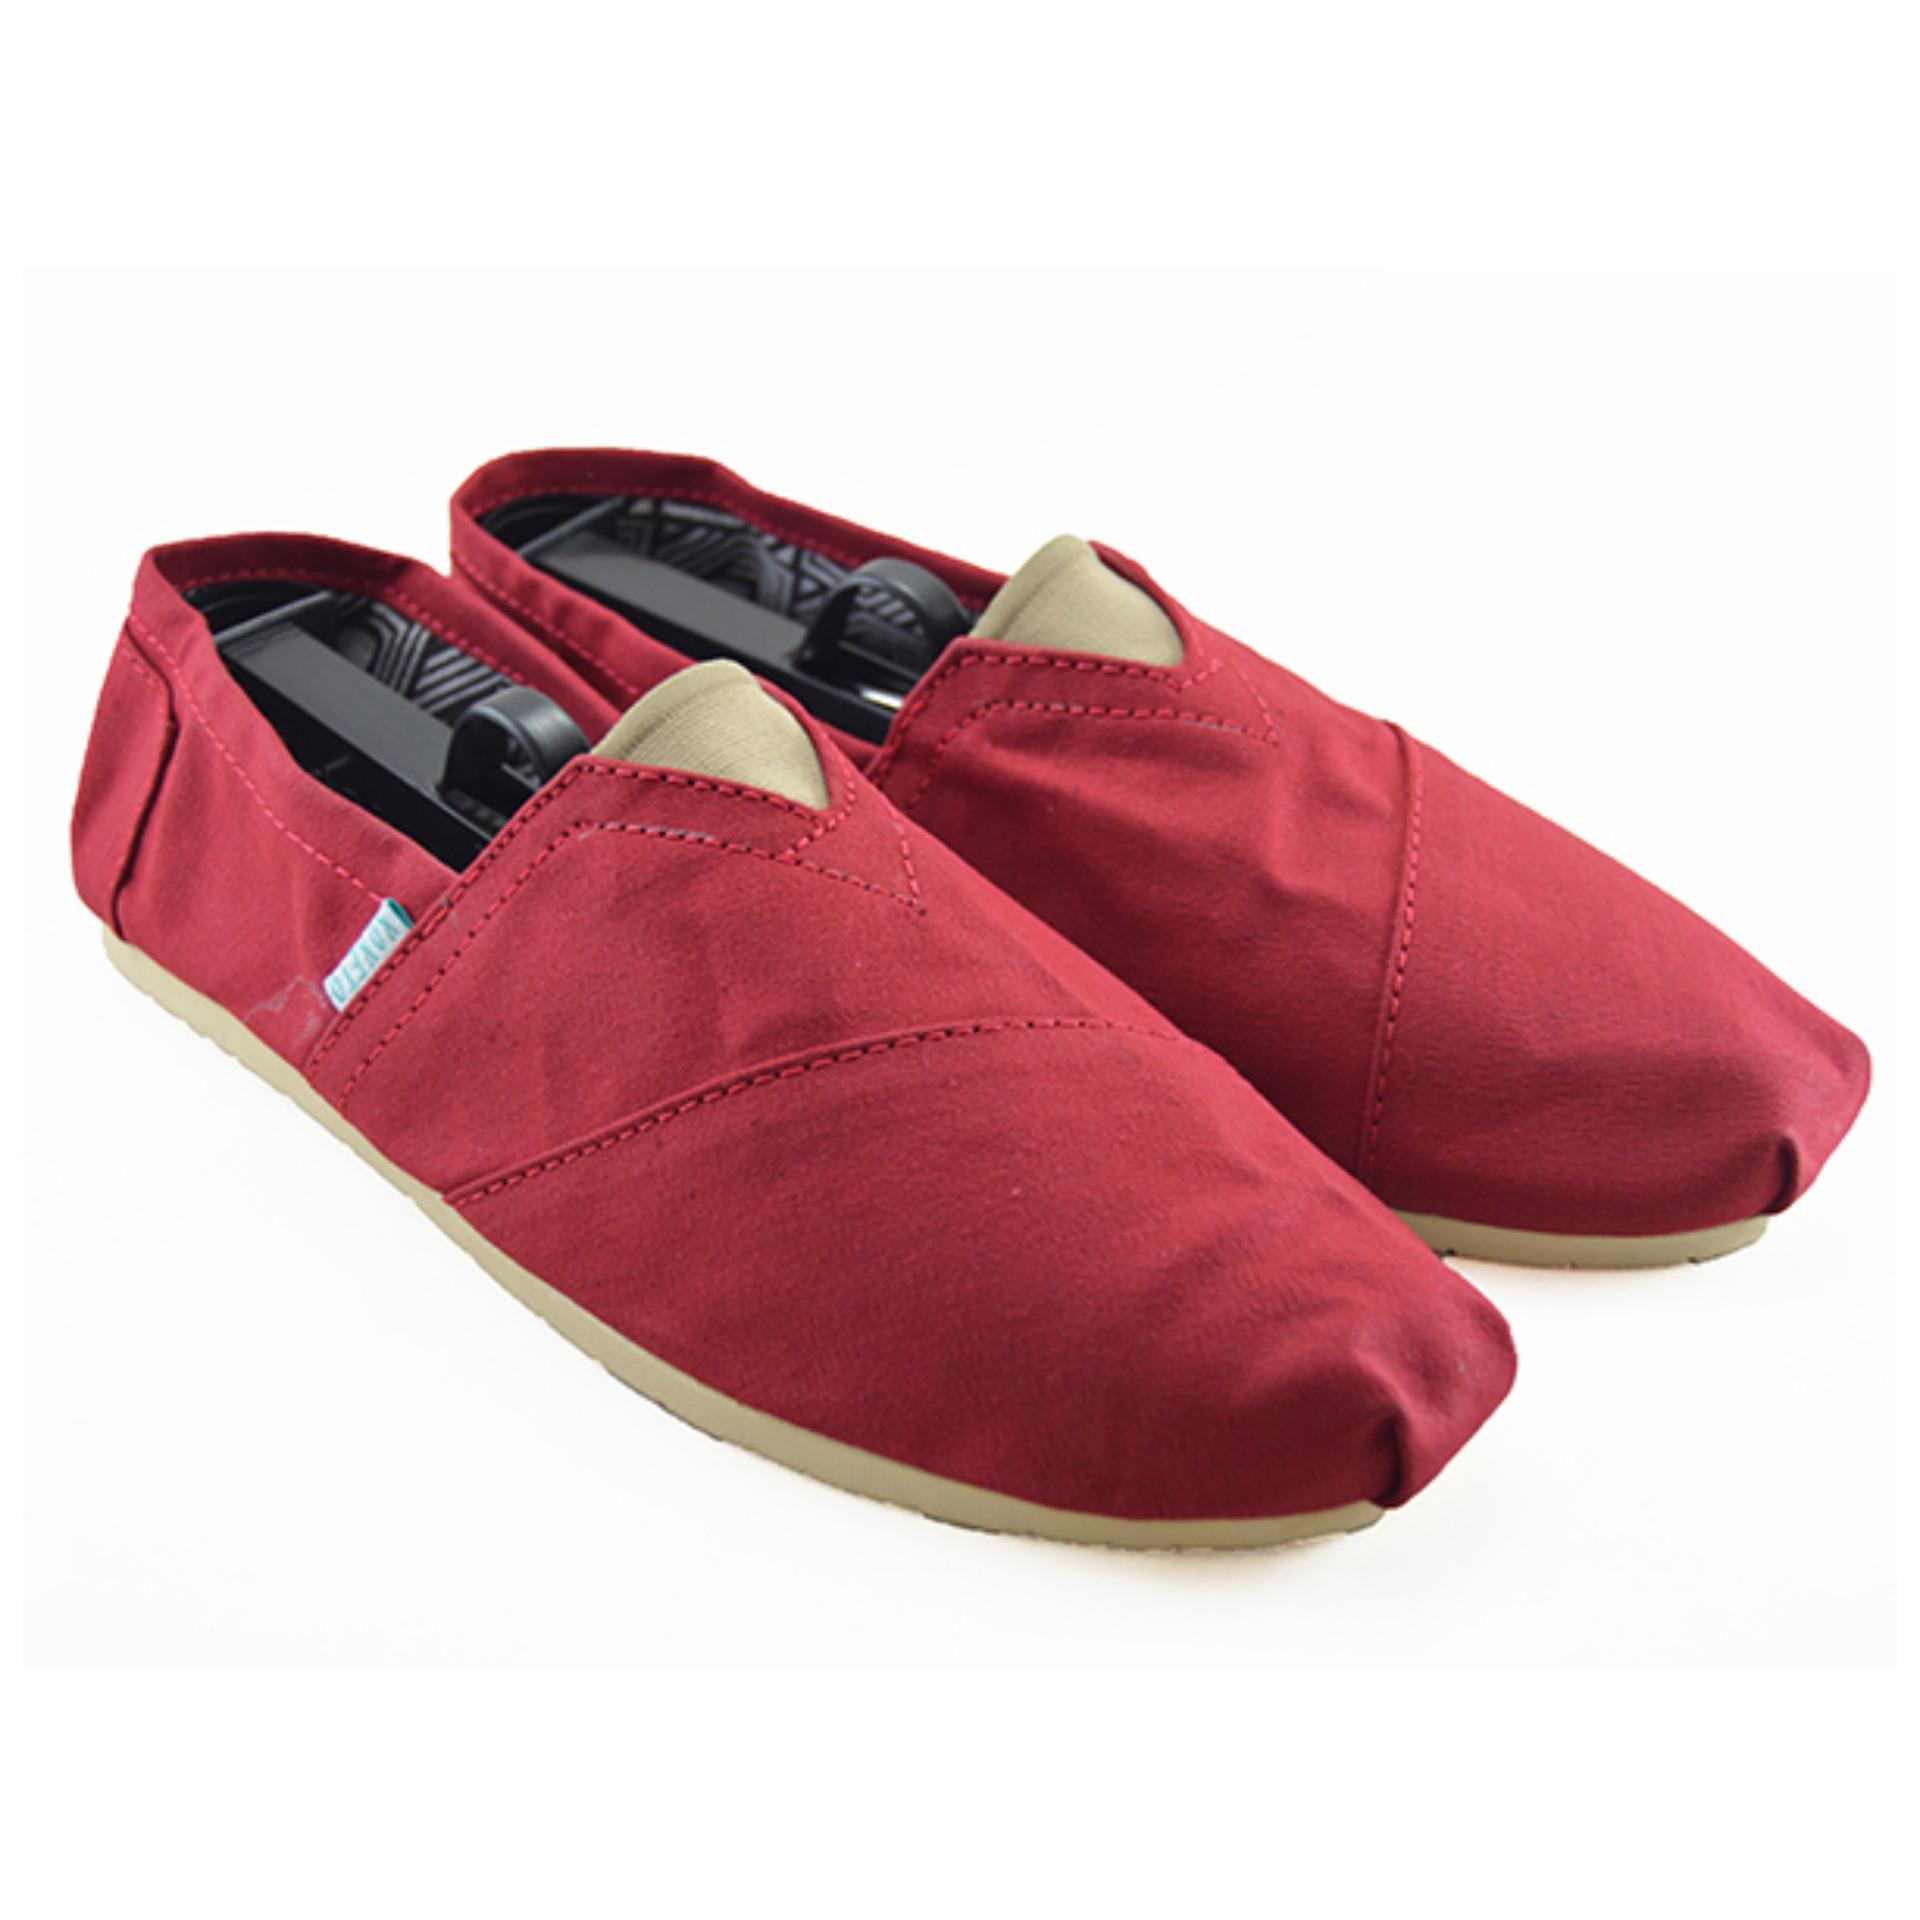 Promo Koketo Ures 02 Sepatu Casual Sneakers Unisex Santai Pria